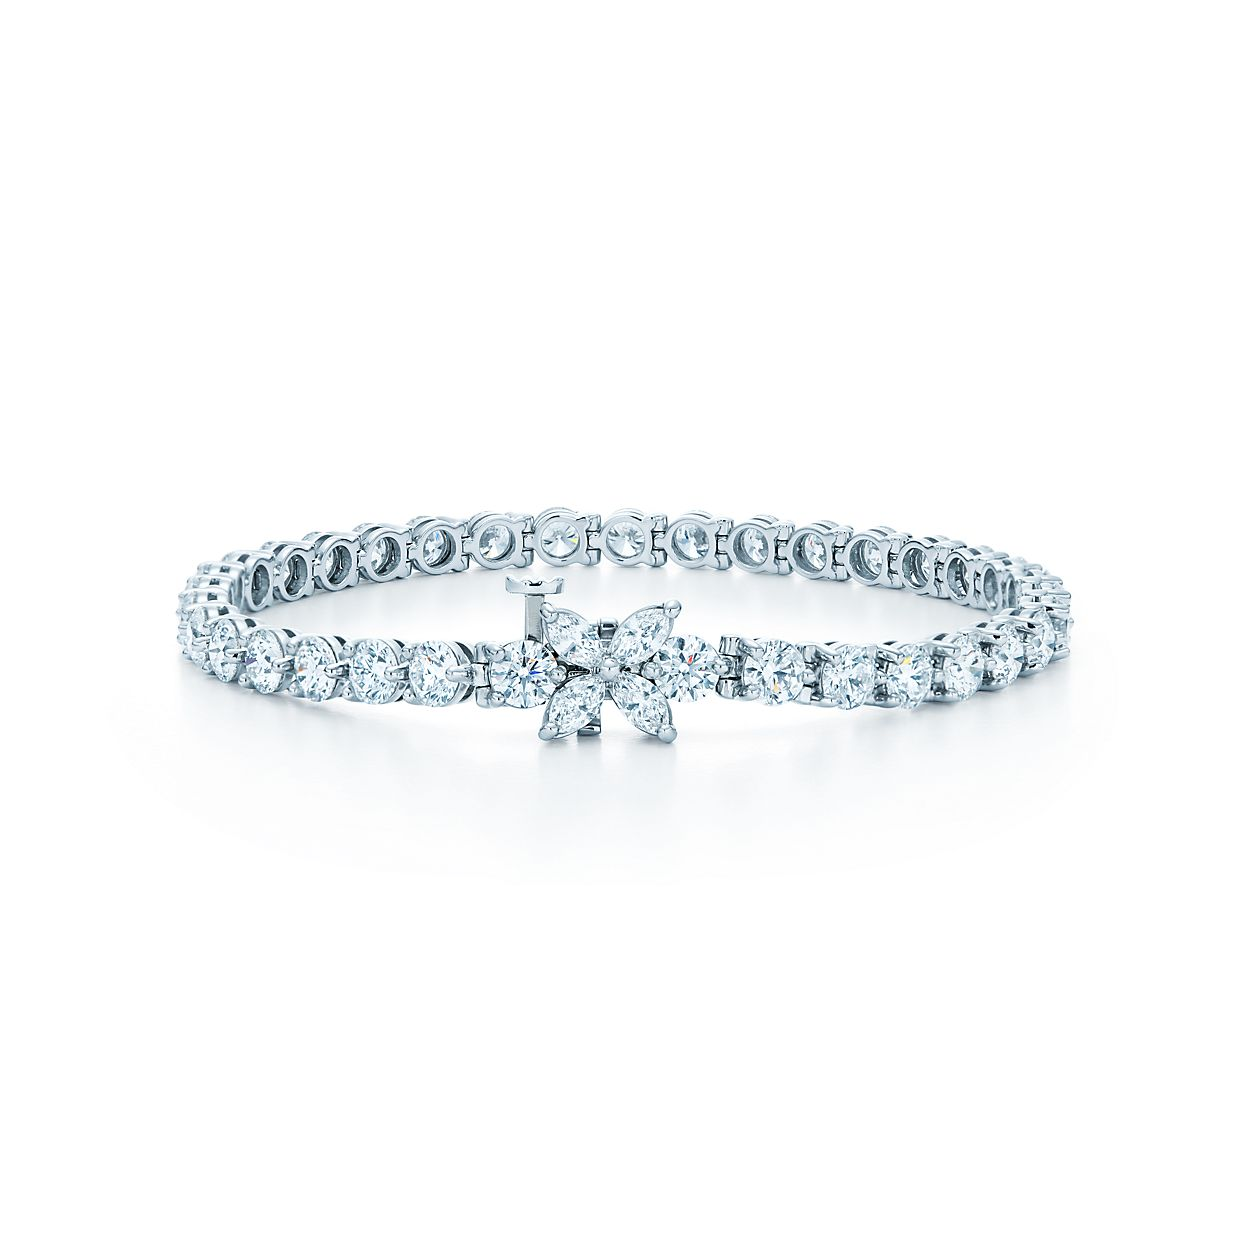 Tiffany Victoria Line Bracelet